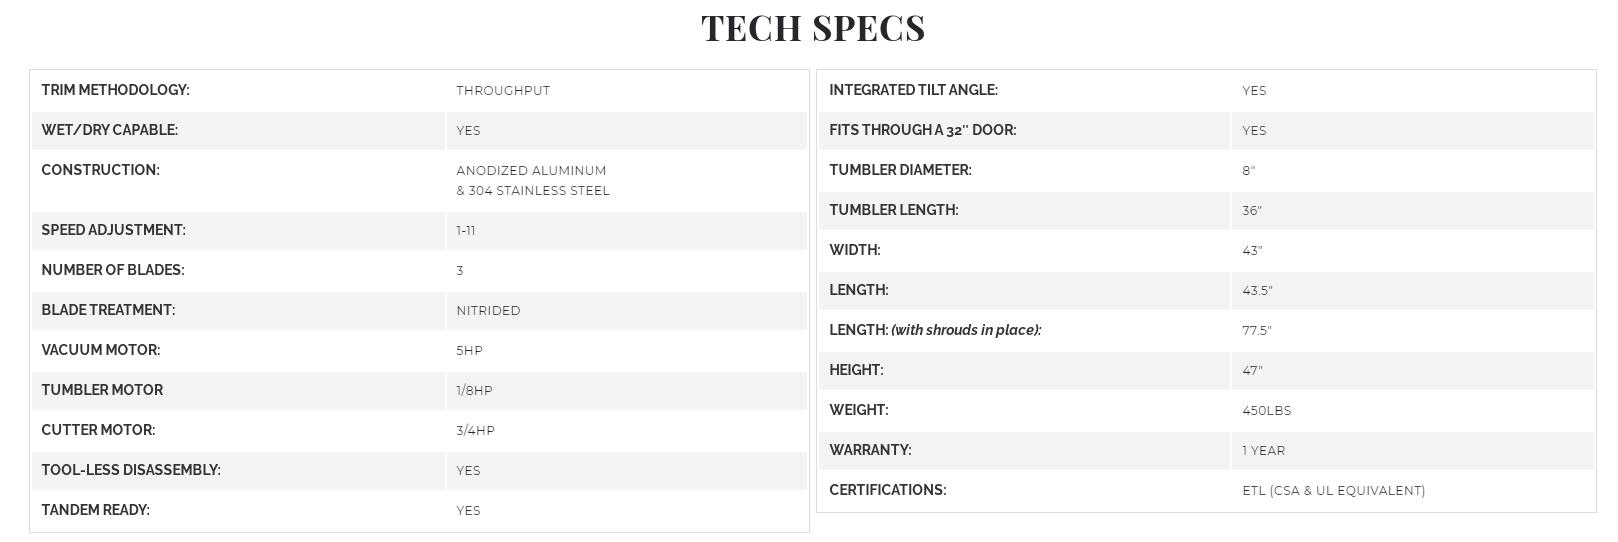 mobius m108s tech specs